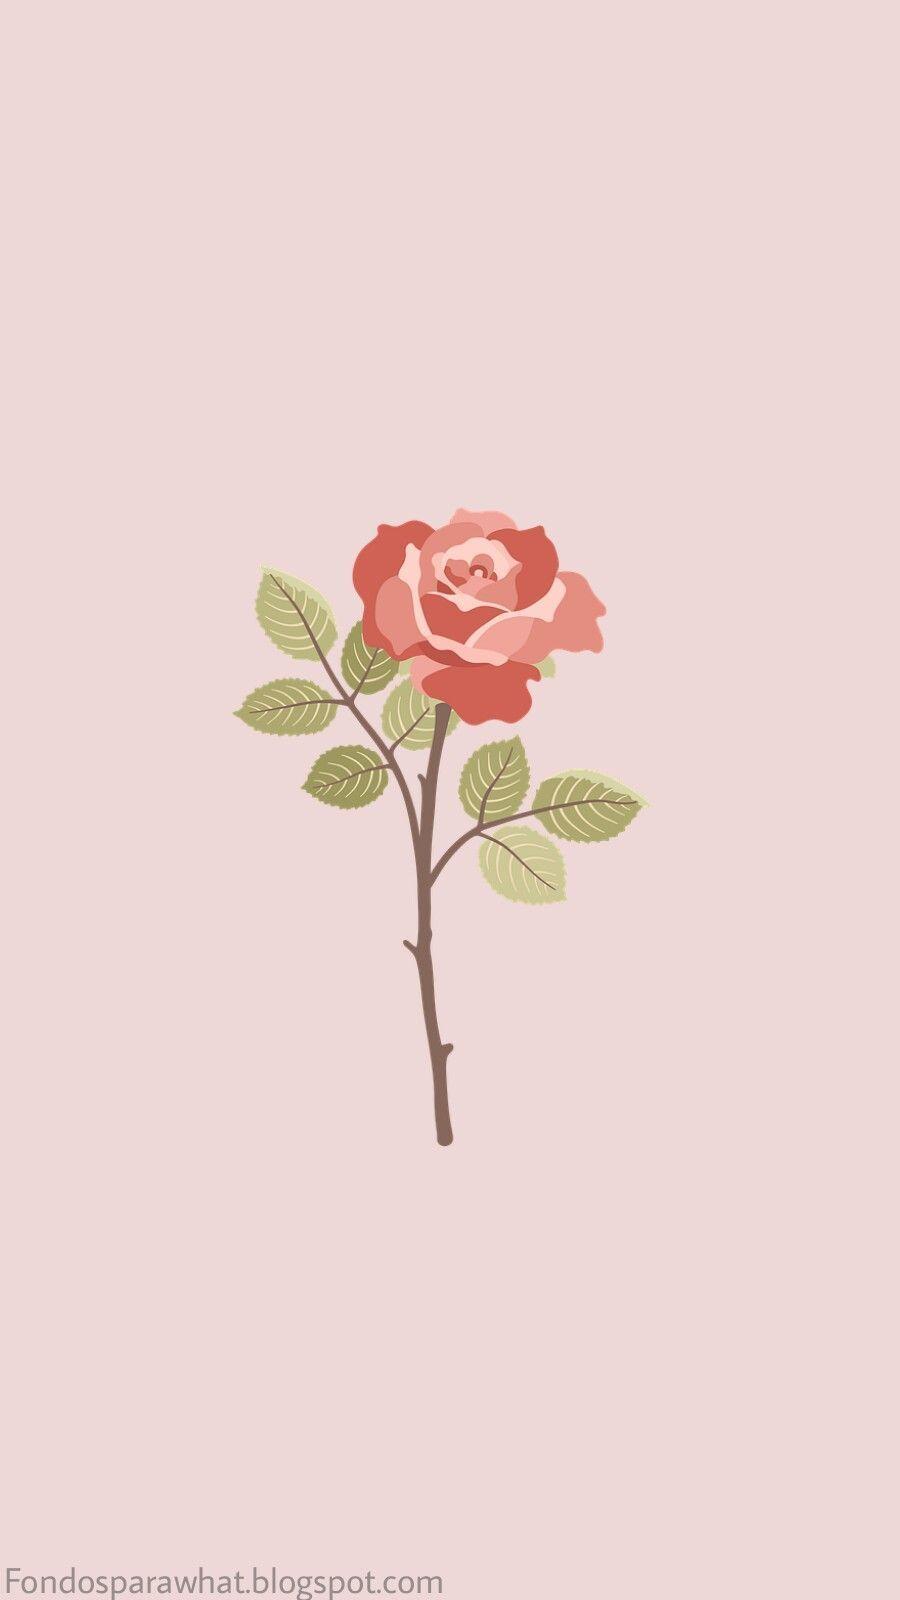 Iphonewallpapers Aesthetic Pastel Wallpaper Rose Wallpaper Art Wallpaper Aesthetic cartoon rose wallpaper